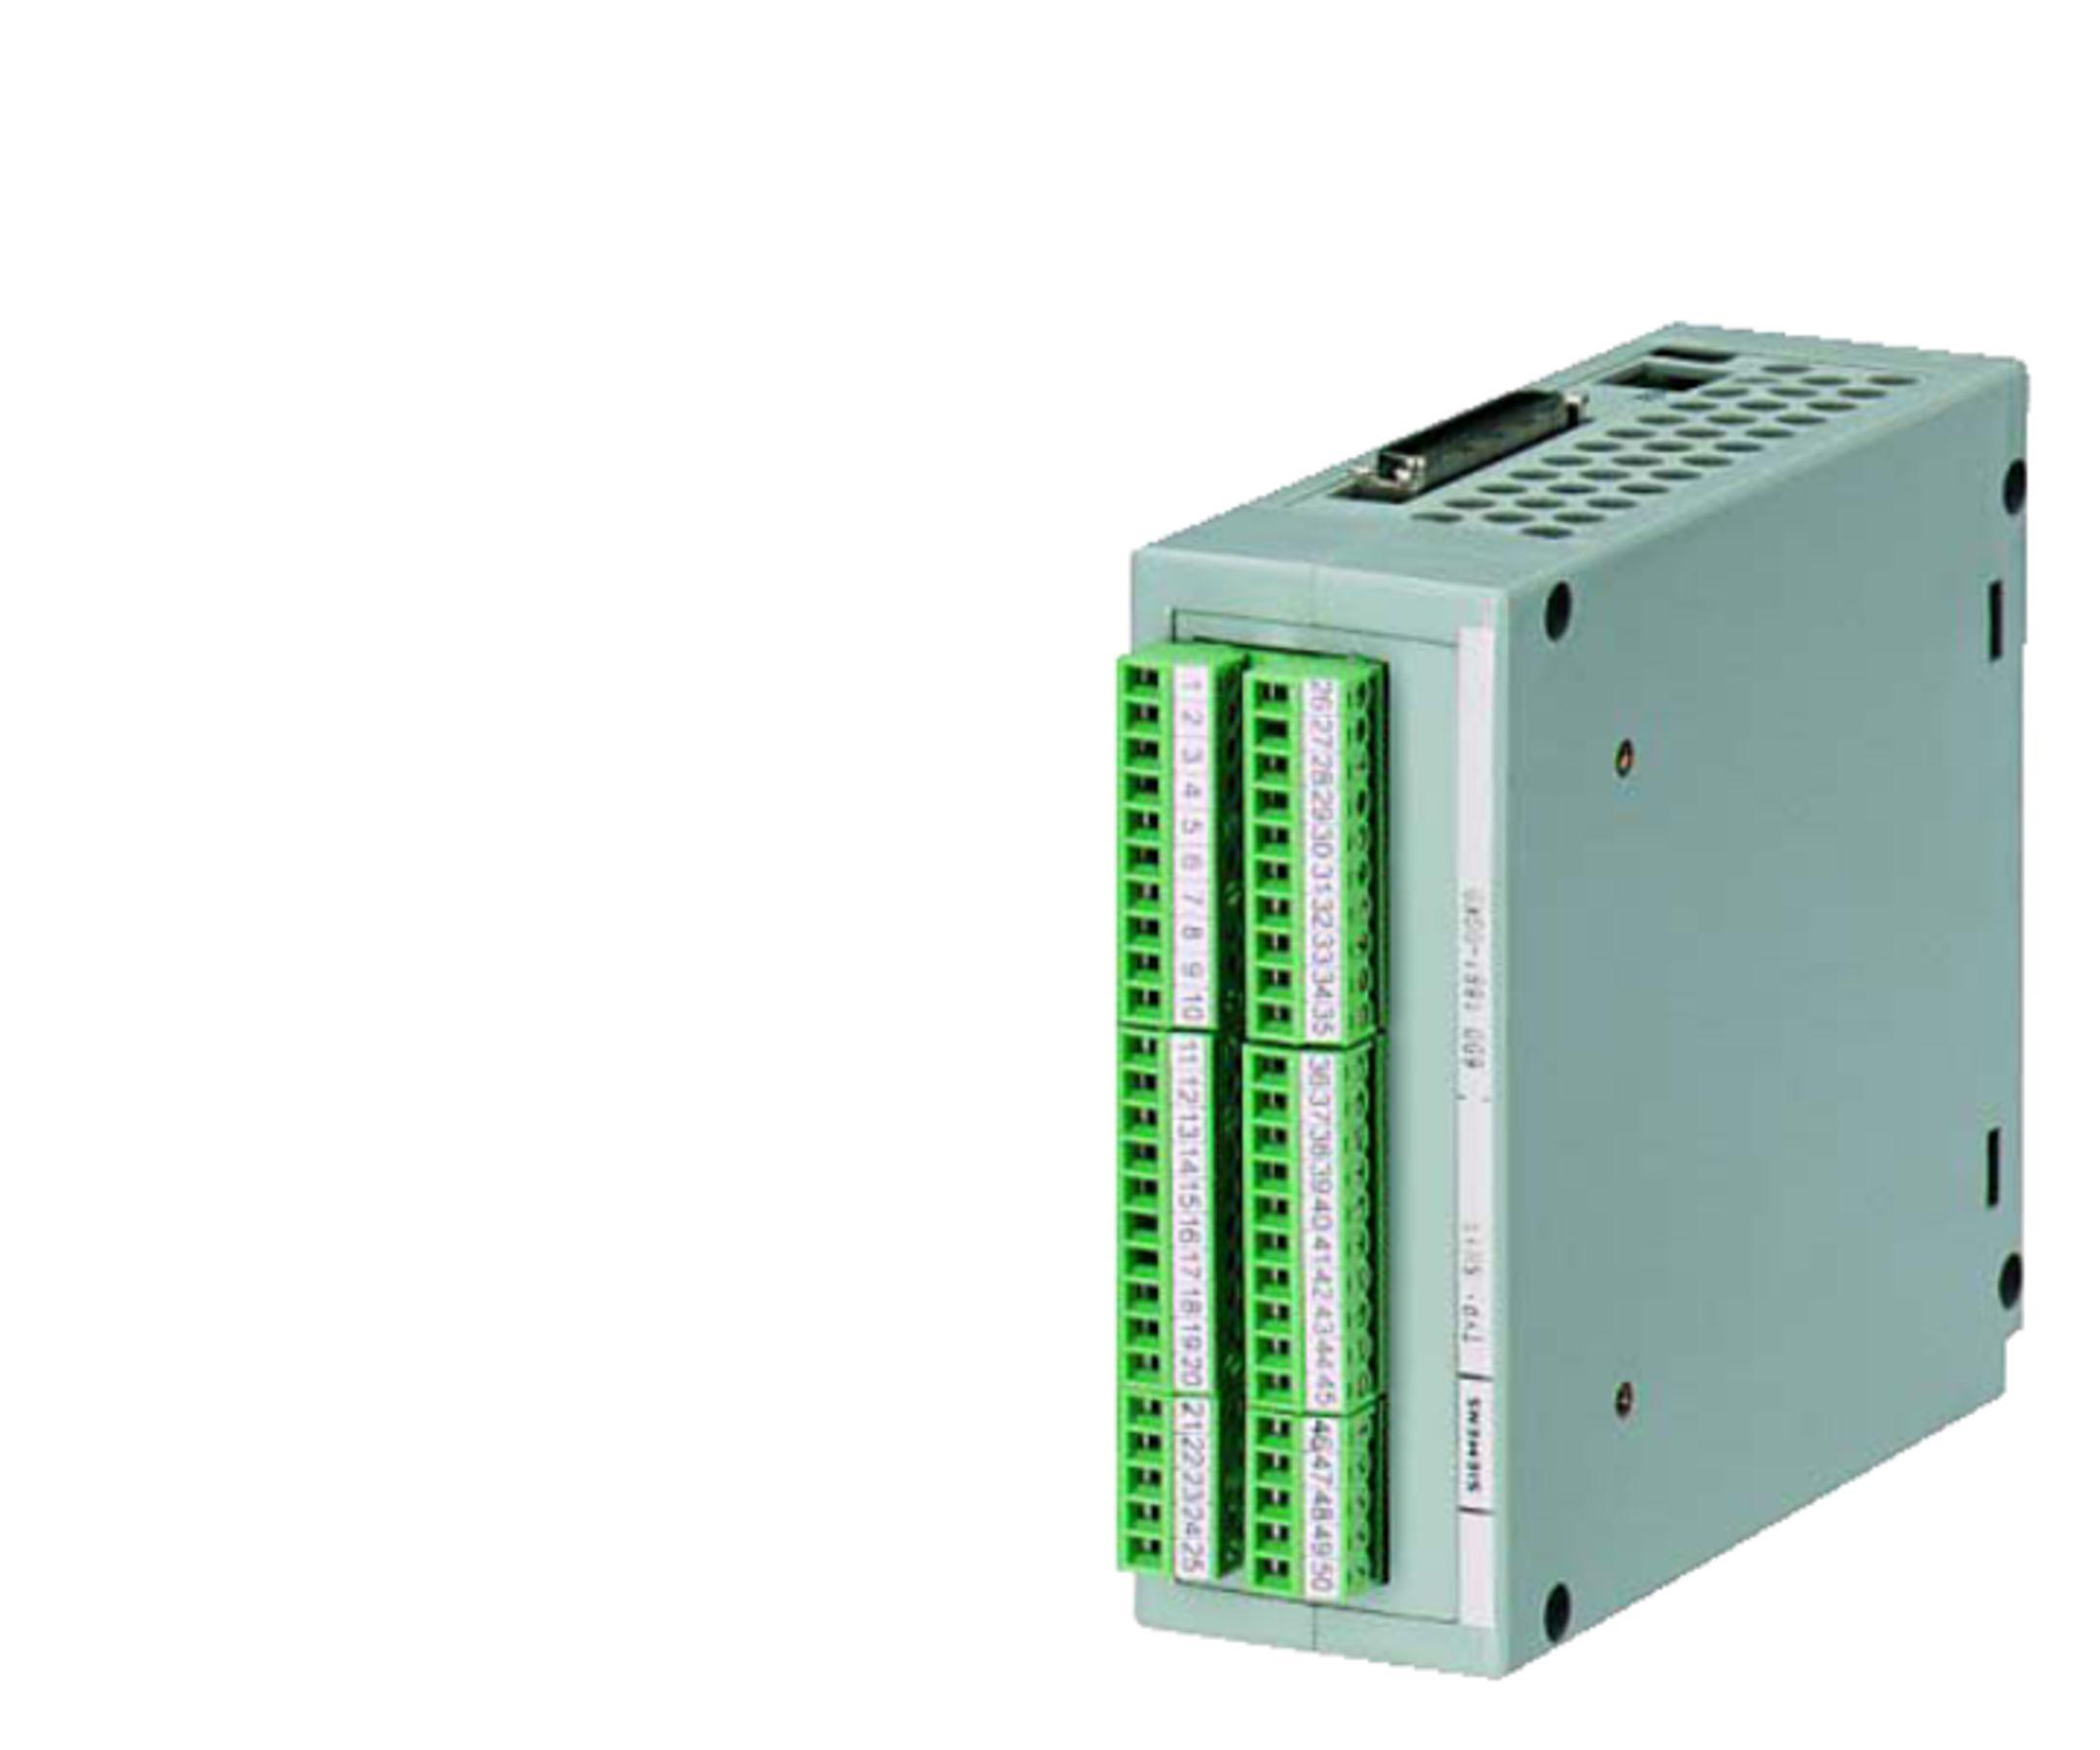 6DD1681-0GK0 Siemens Interface Module | SU13 | SIMATIC S7